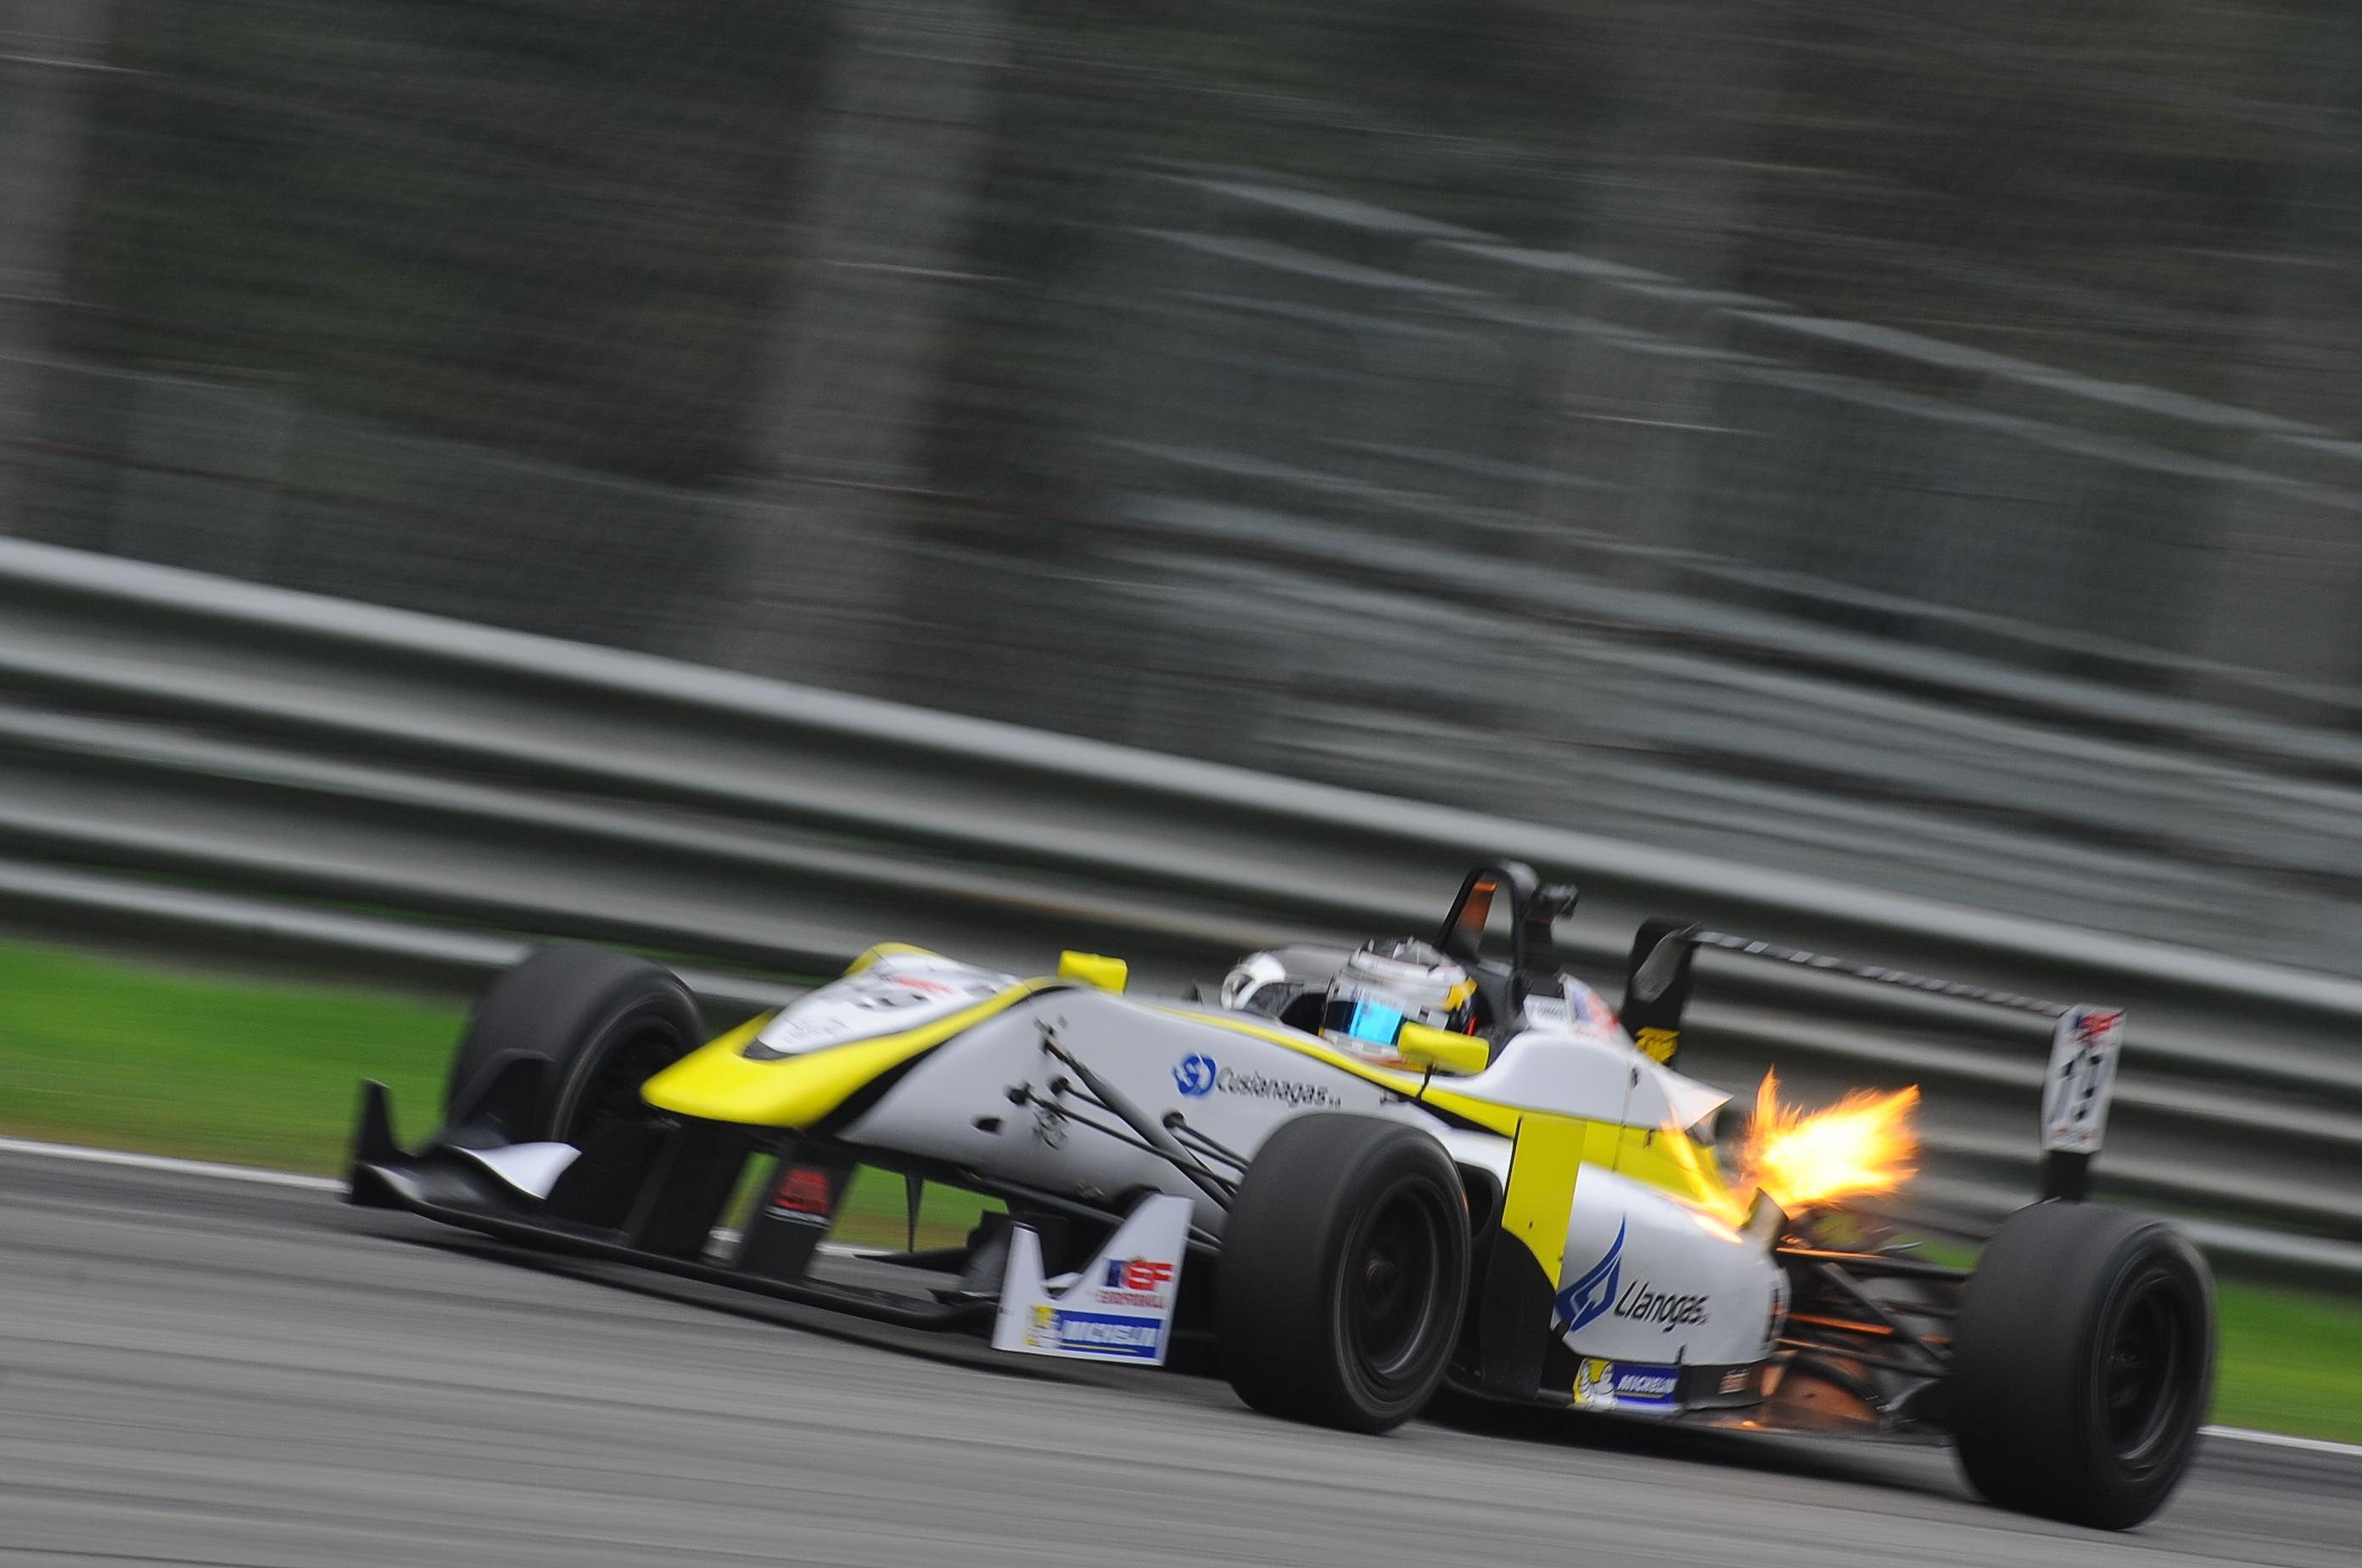 WilliamBarbosaG.EuroformulaOpen.Monza.Octubre_15.JPG